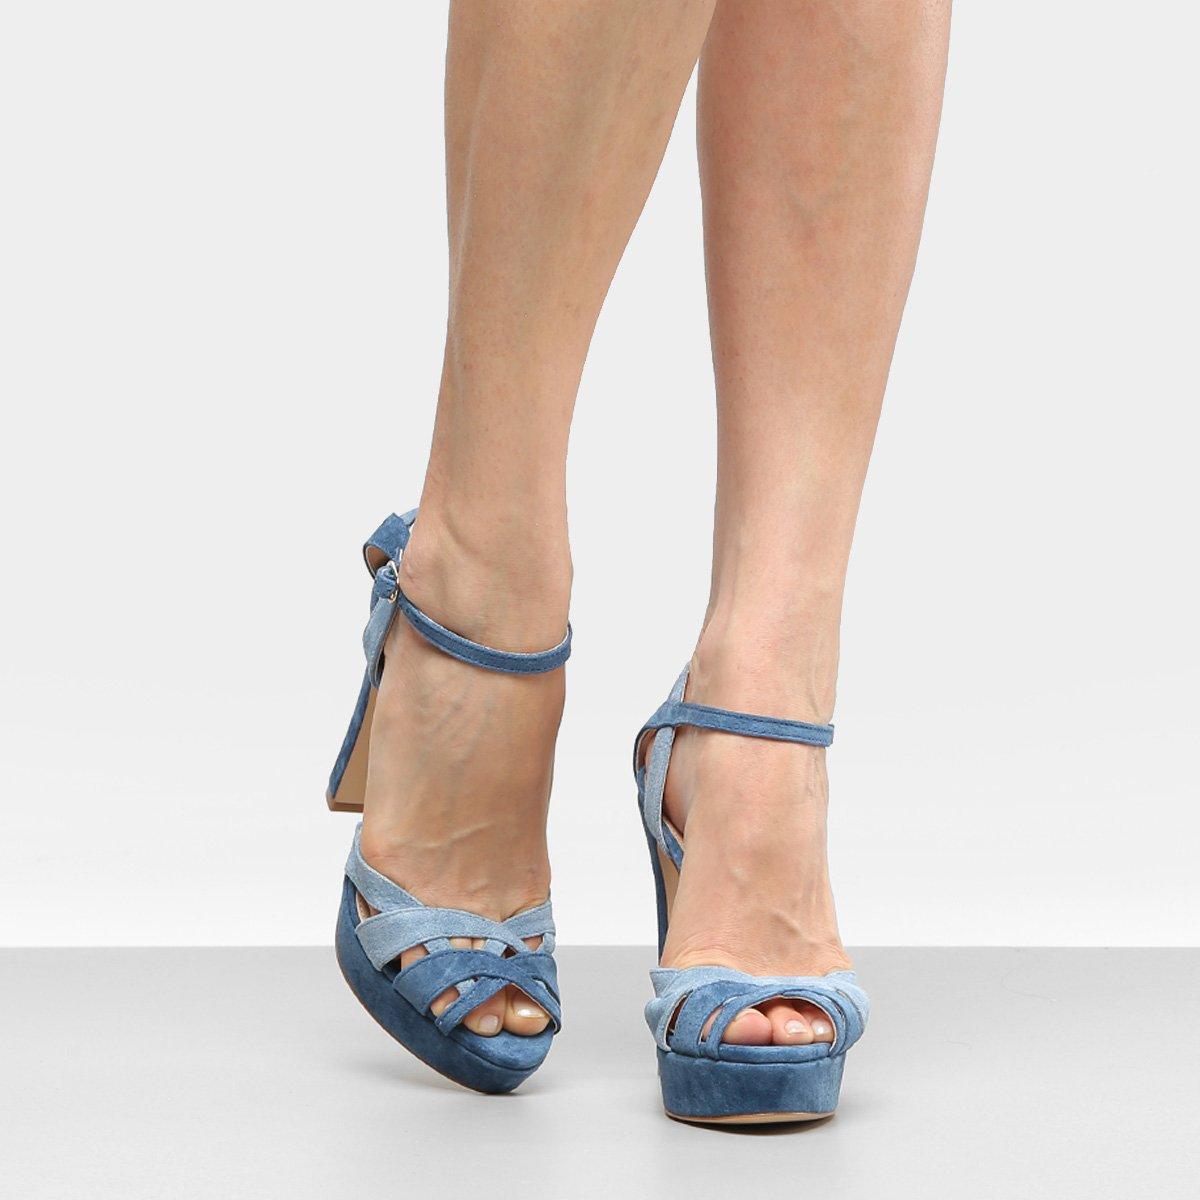 45d14ba1d Sandália Couro Shoestock Meia Pata Mix Cores Feminina - Azul | Shoestock